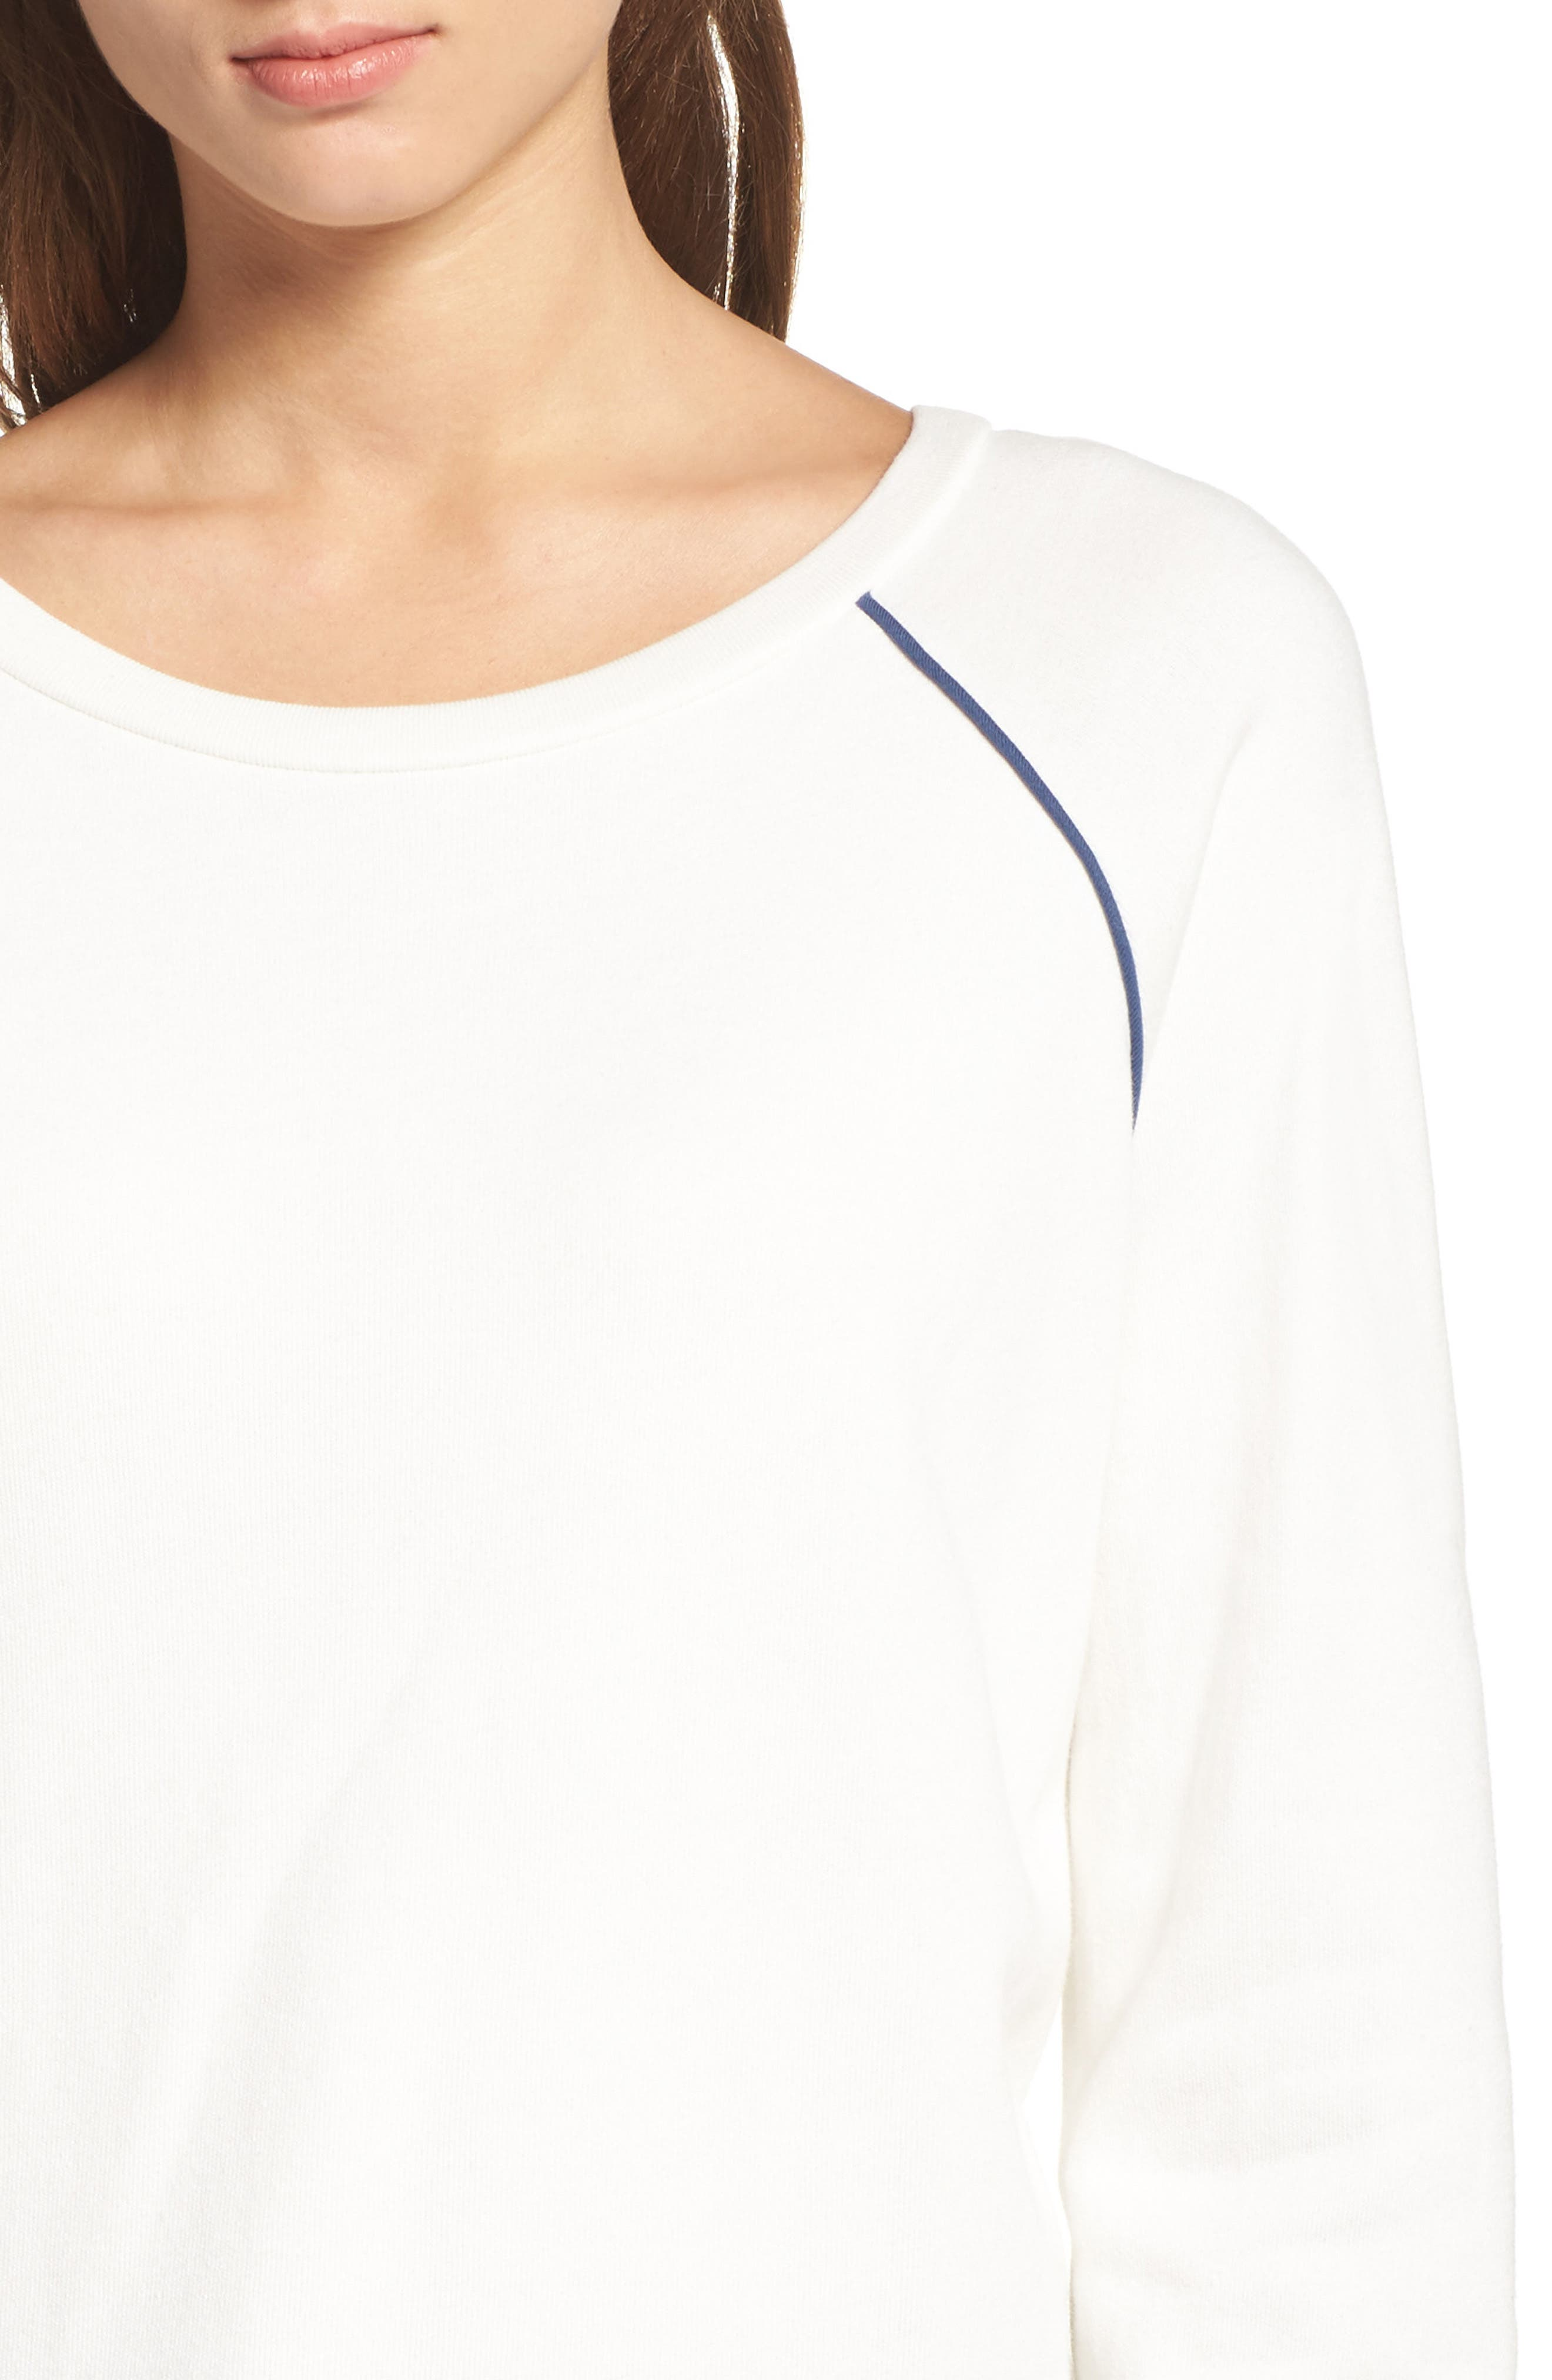 Juniper Lounge Sweatshirt,                             Alternate thumbnail 5, color,                             Milk/ Ink Blue